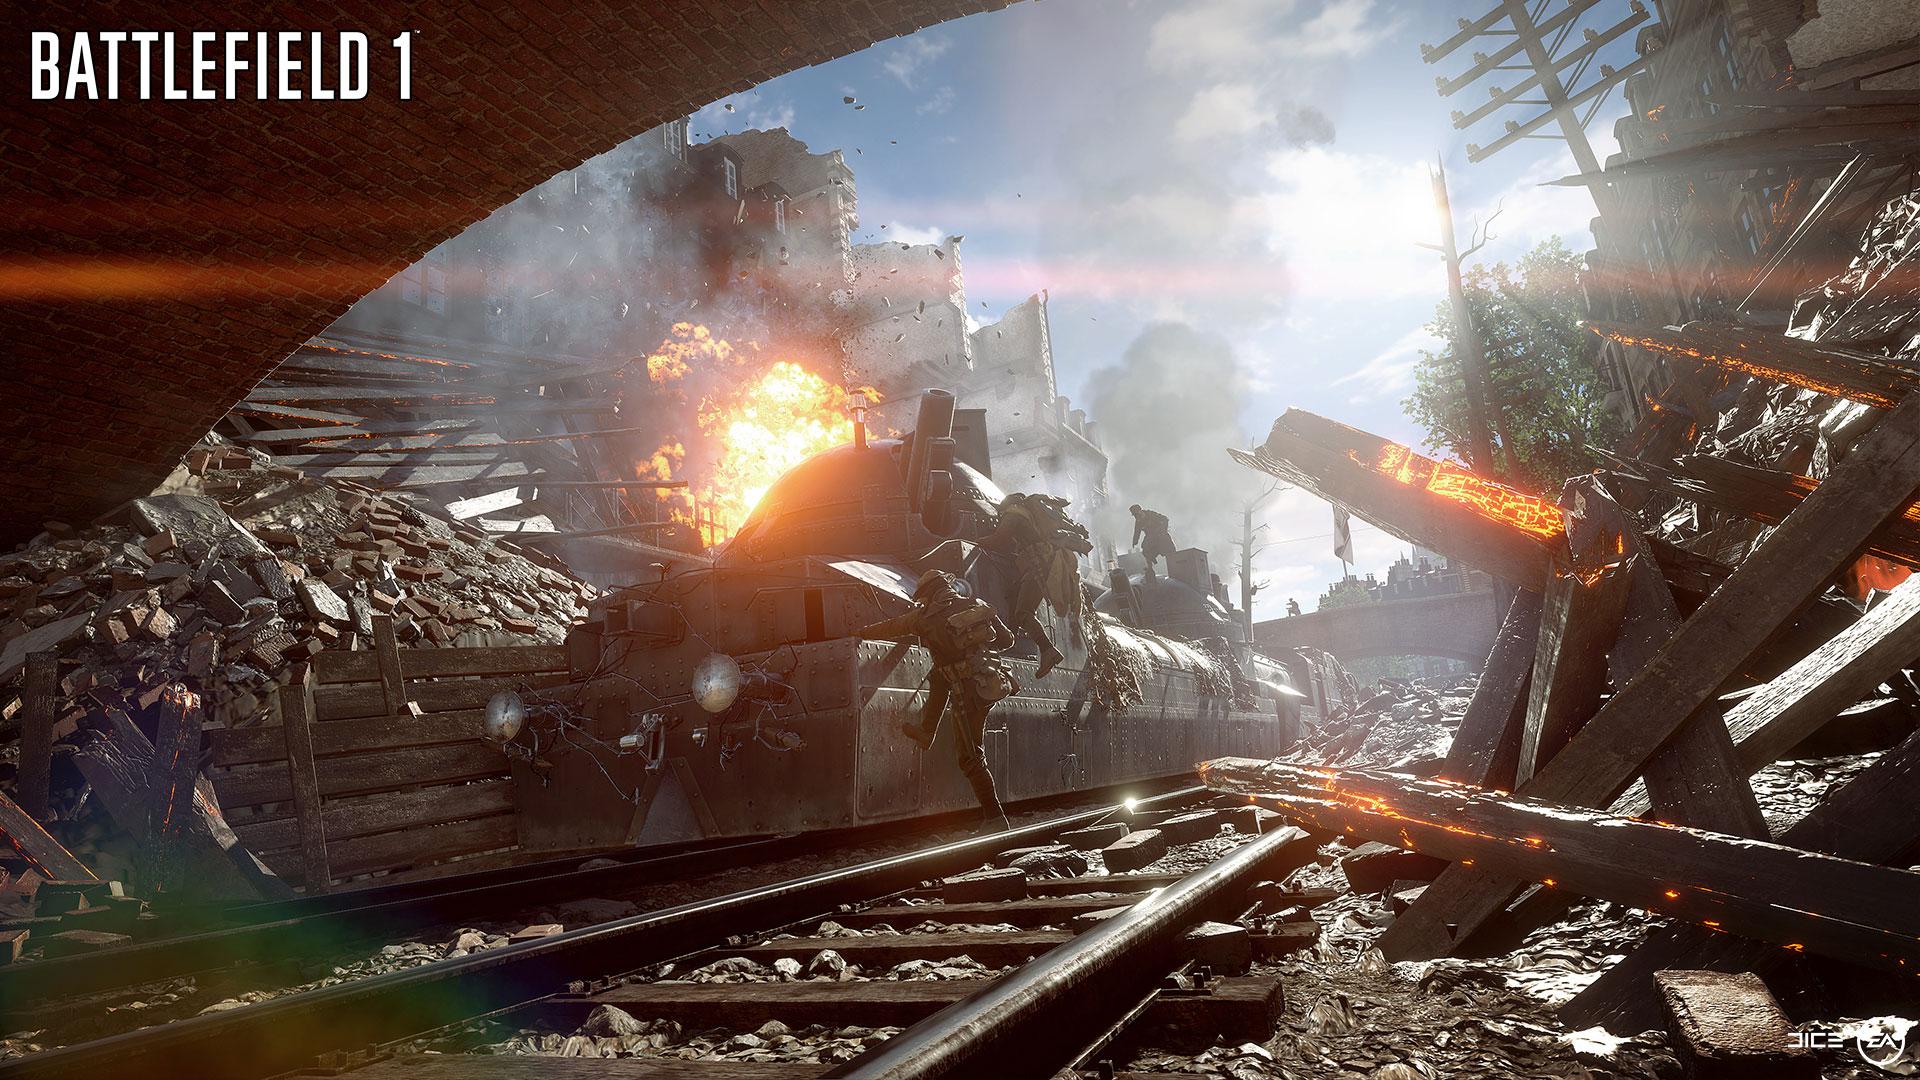 Battlefield 1 Wallpapers 22 Wallpapers Adorable Wallpapers